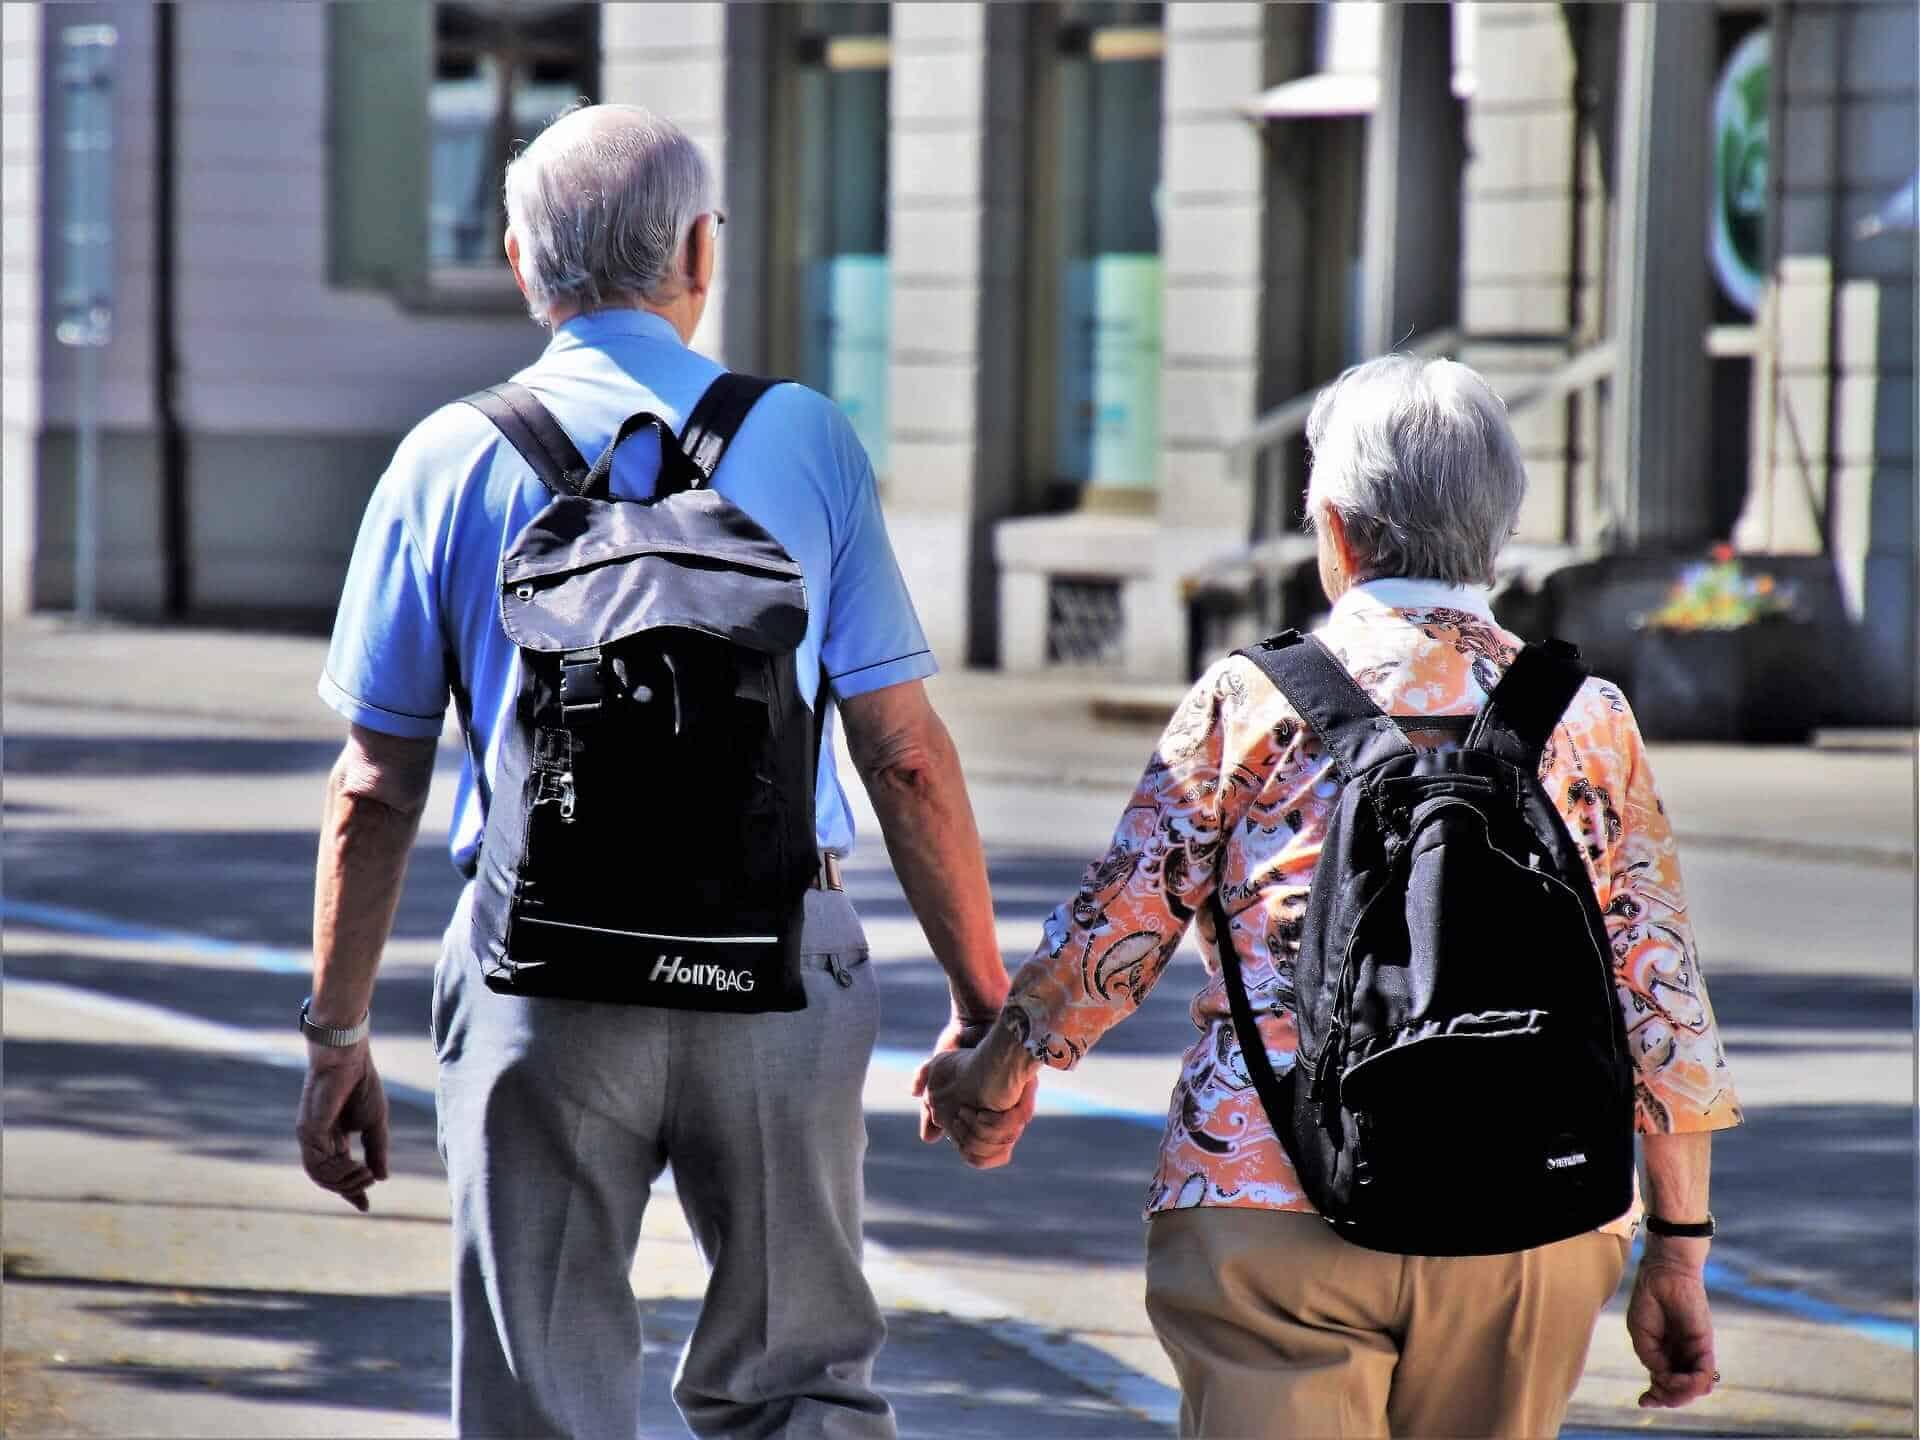 senior people traveling